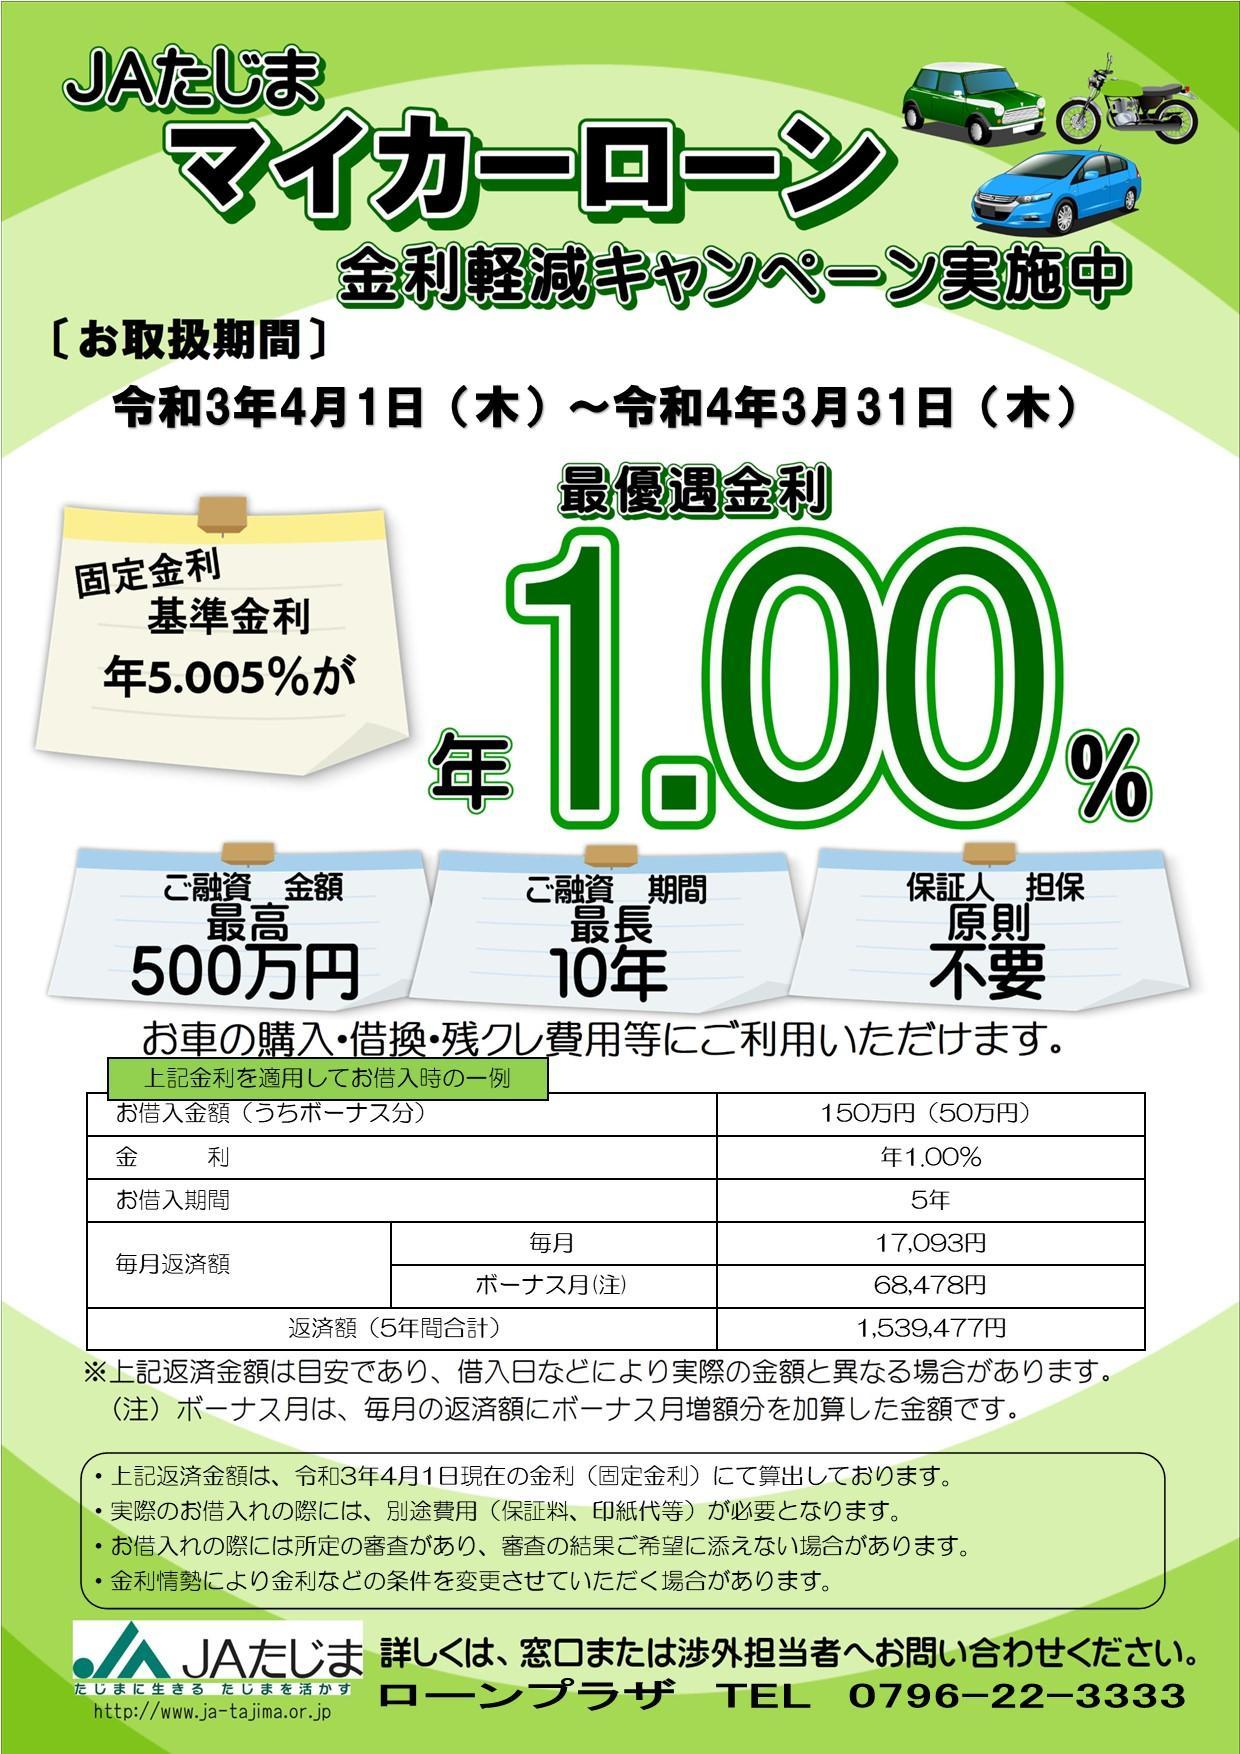 https://www.ja-tajima.or.jp/finance/adaabe9620465657b4d0630f1df4a1612c9af722.jpg